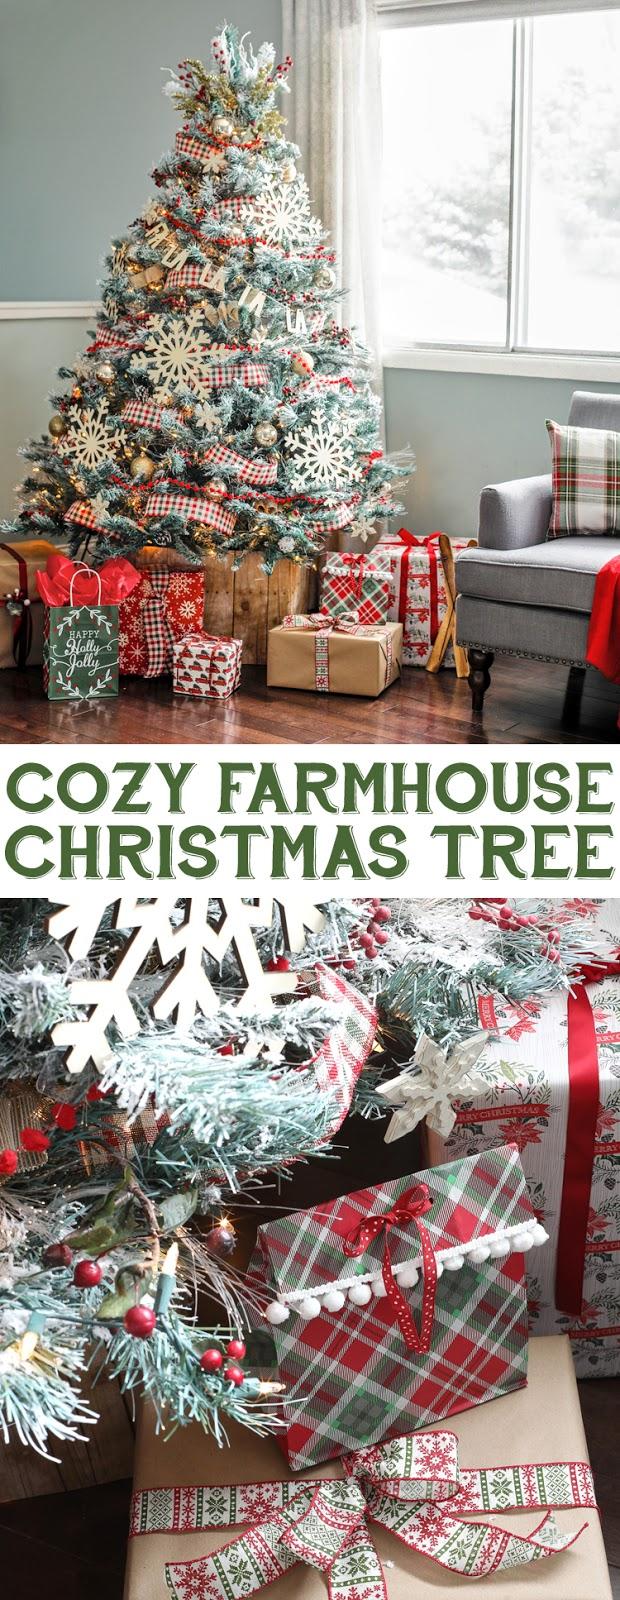 Farmhouse Style Christmas Tree. Plaid Christmas decorations. Gorgeous Christmas tree decorating ideas. #christmastree #handmadewithjoann